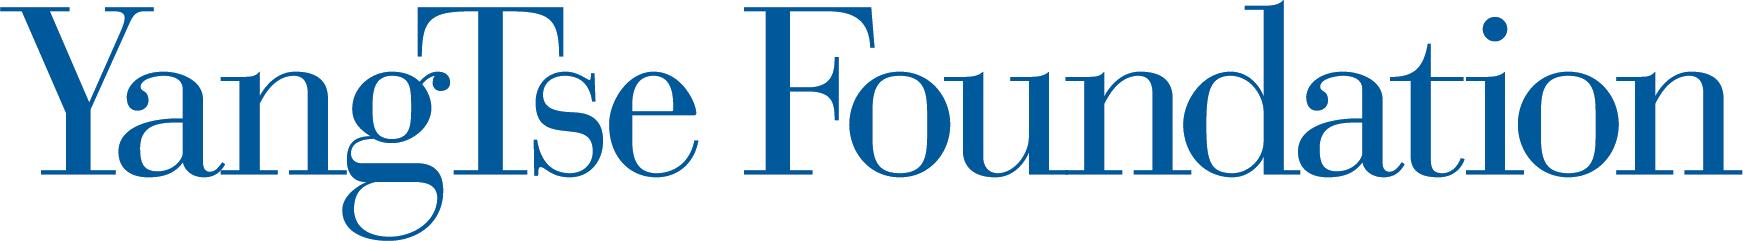 YangTse Foundation_logo_4C.JPG.png